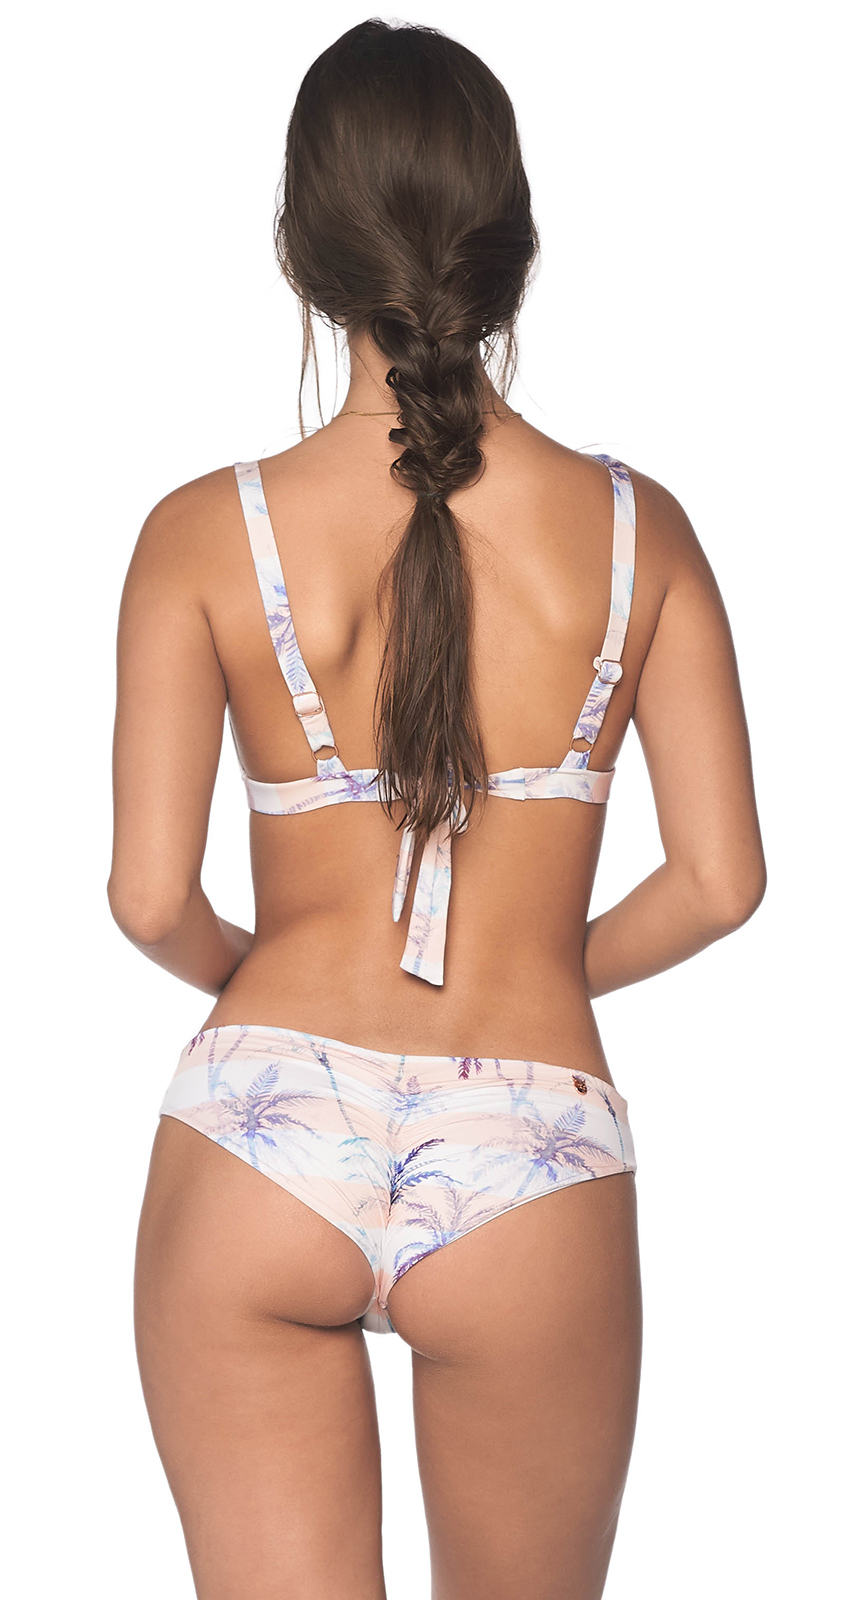 01e6210a8b369 ... Triangle bra bikini in pastel tropical print - SEAMLESS CALI PLAMS ...